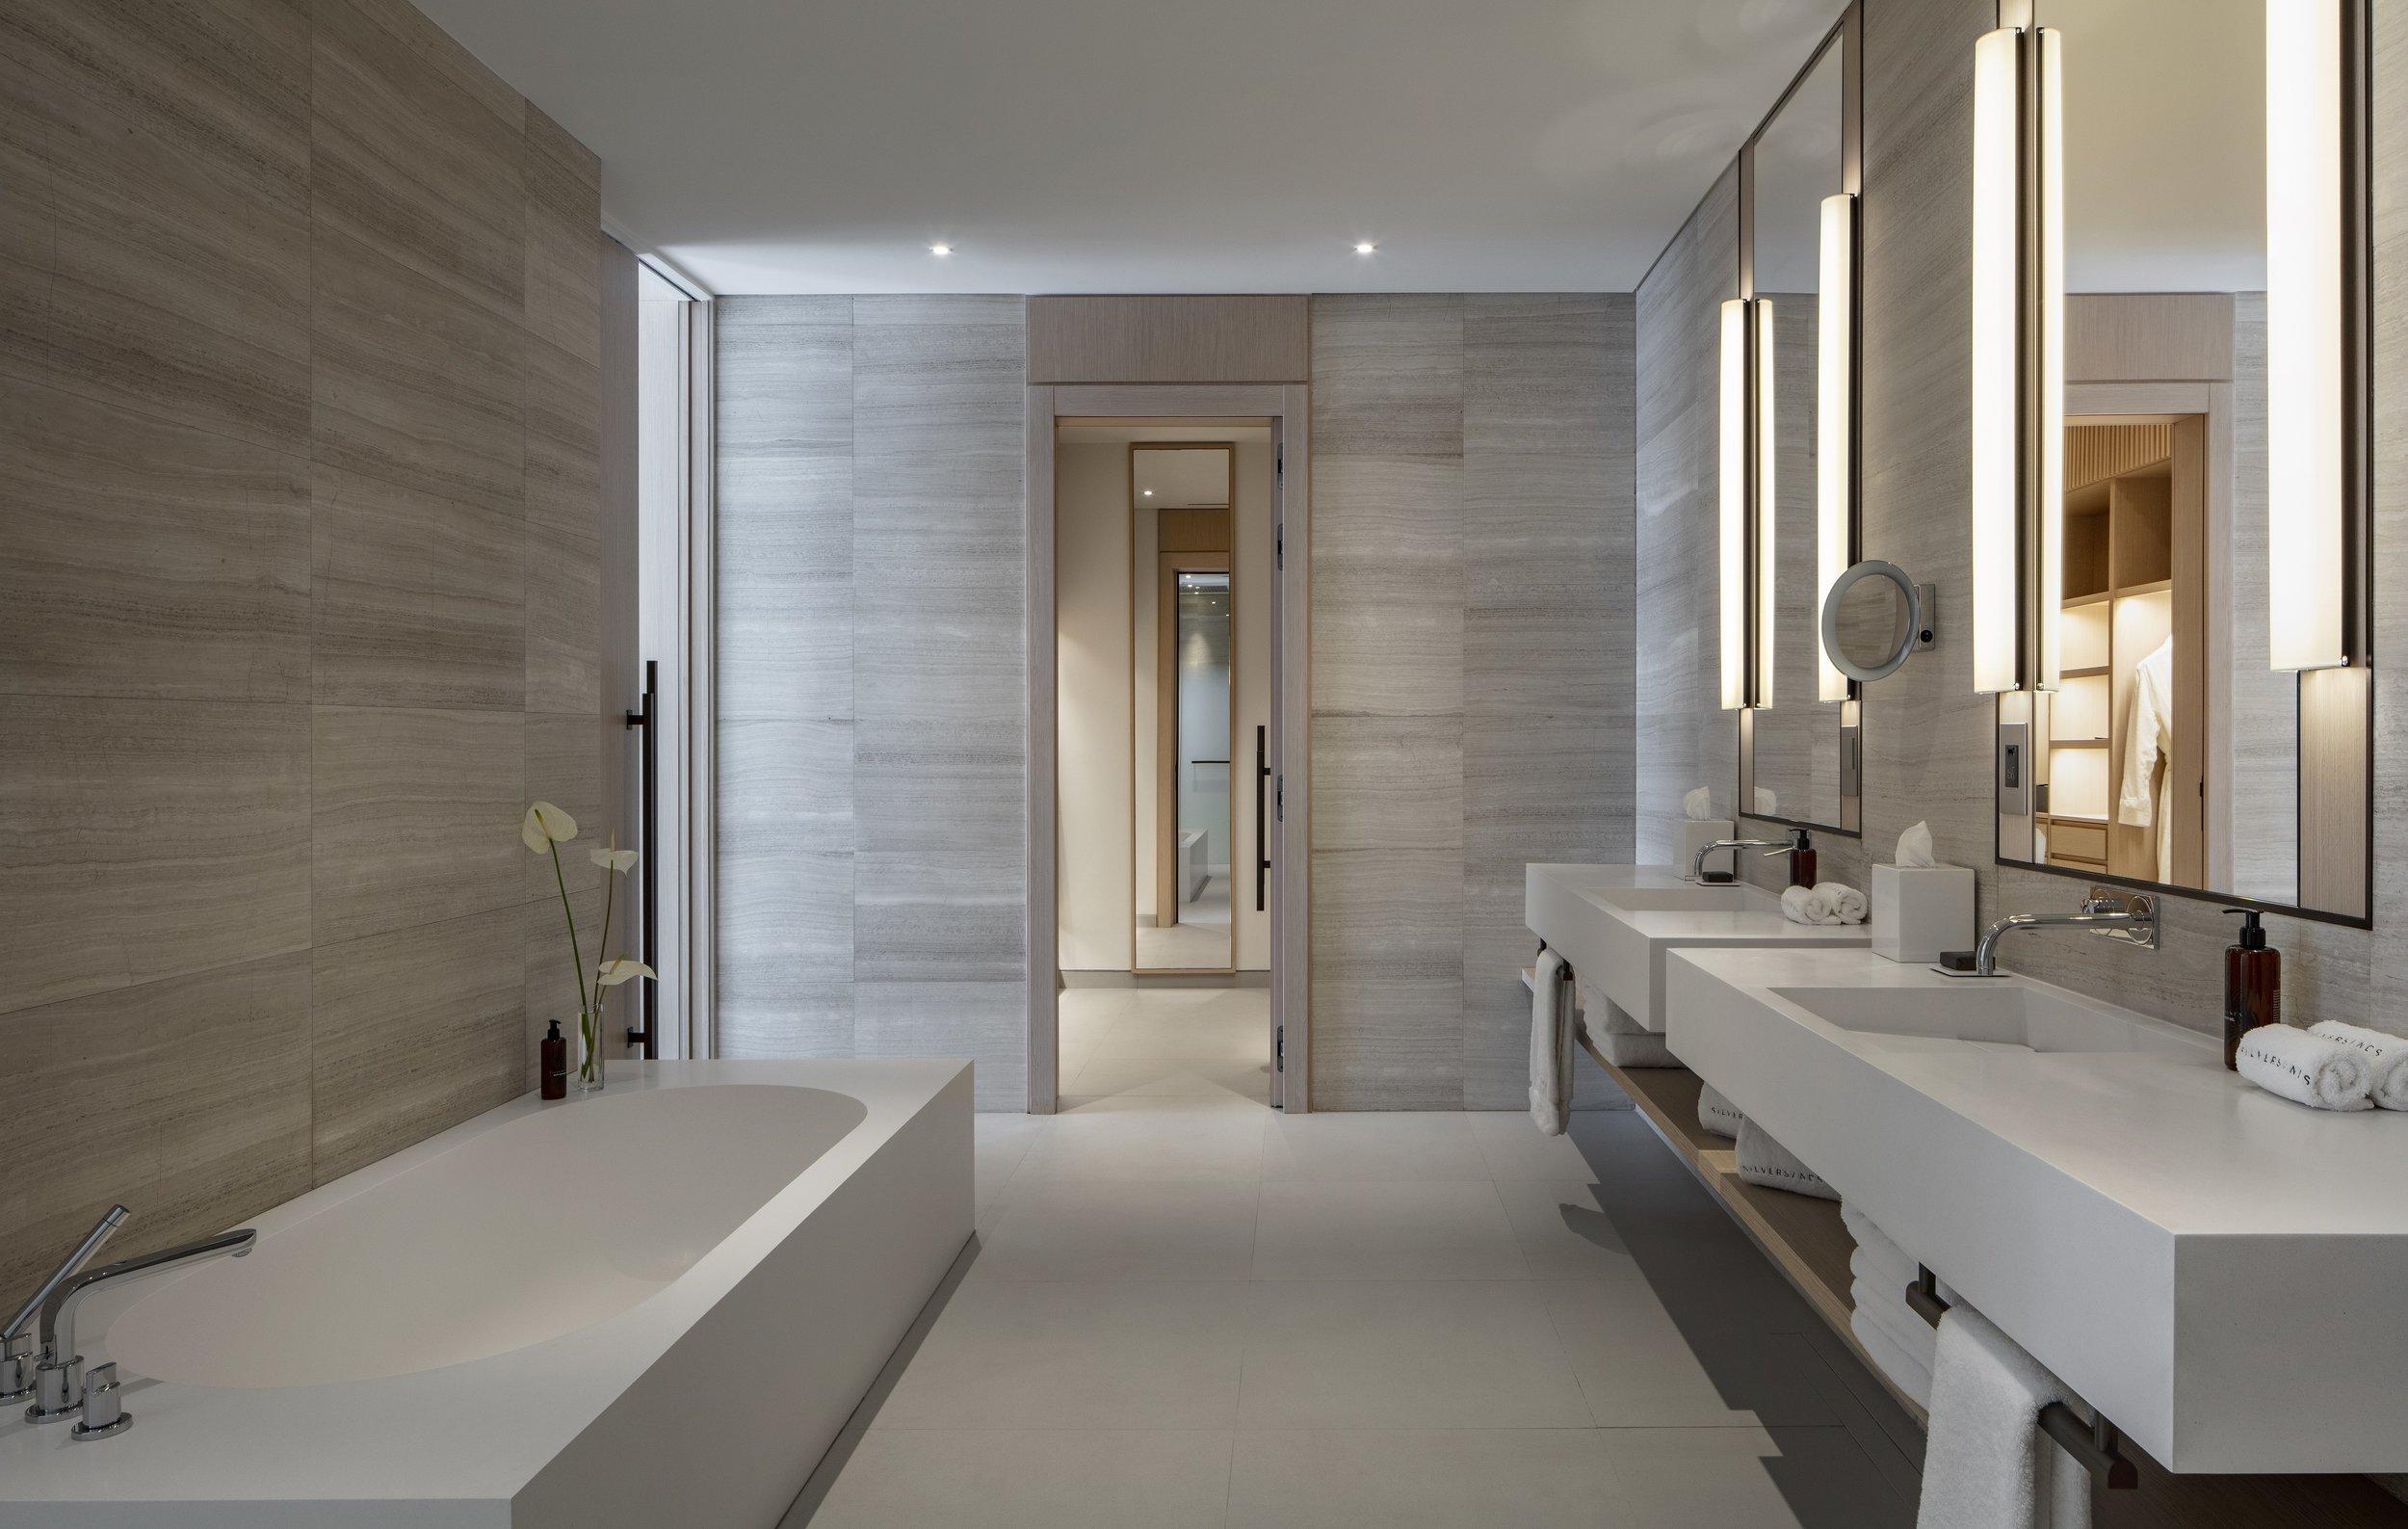 One Bedroom Suite Bathroom and Changing Room.jpg